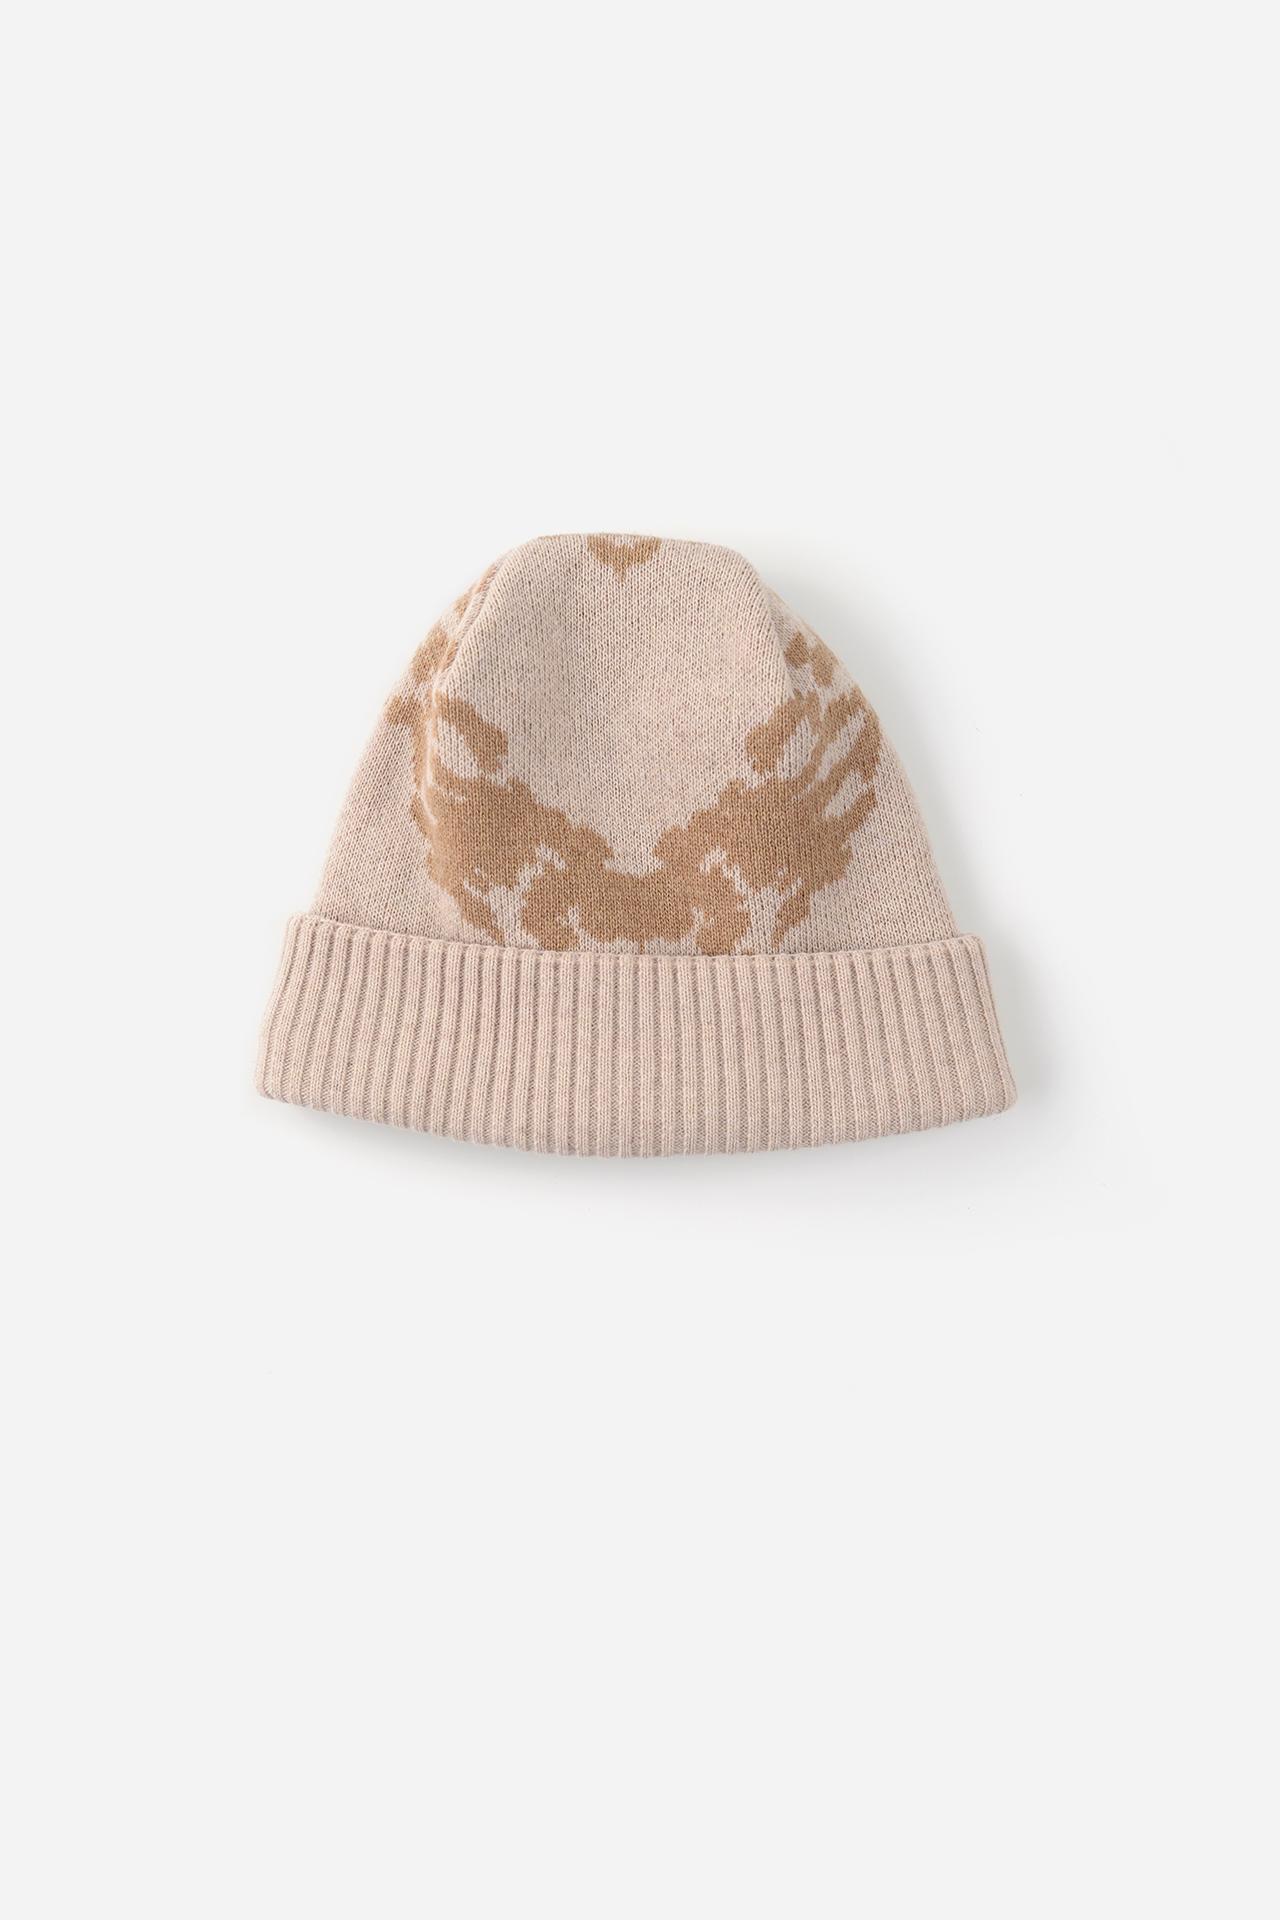 Jacquard Knit Beanie Beige